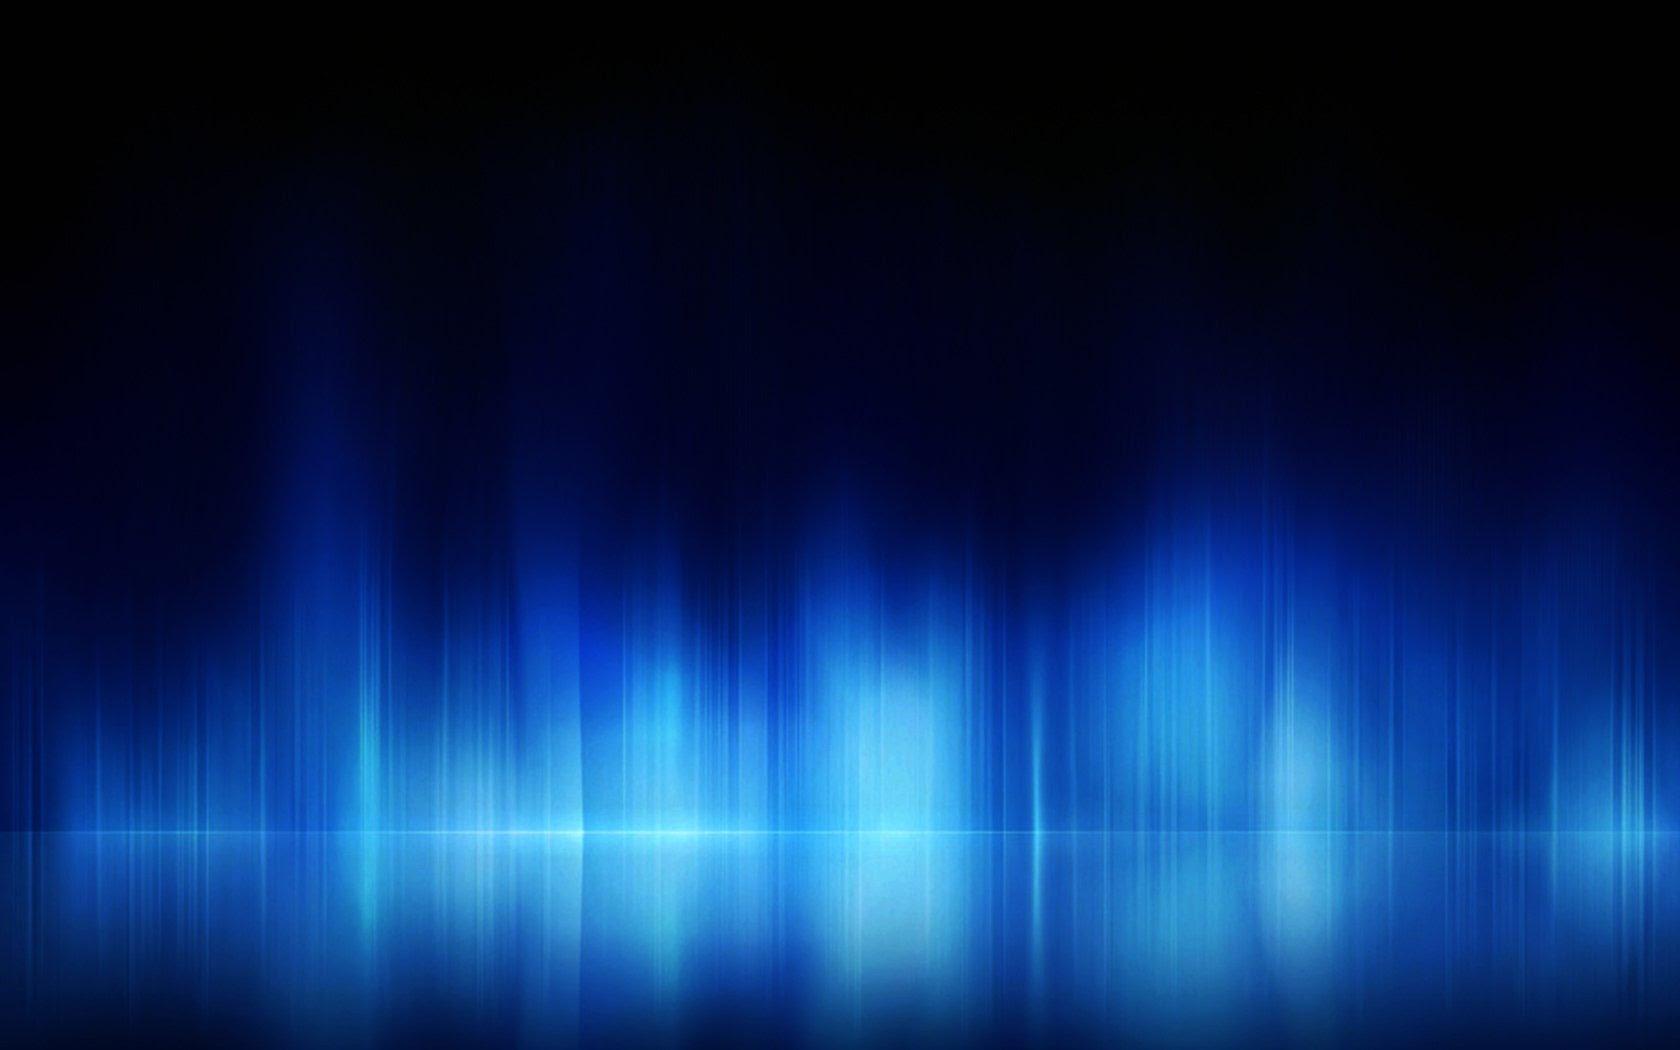 Unduh 46 Koleksi Background Biru Abstrak Hd Gratis Terbaik